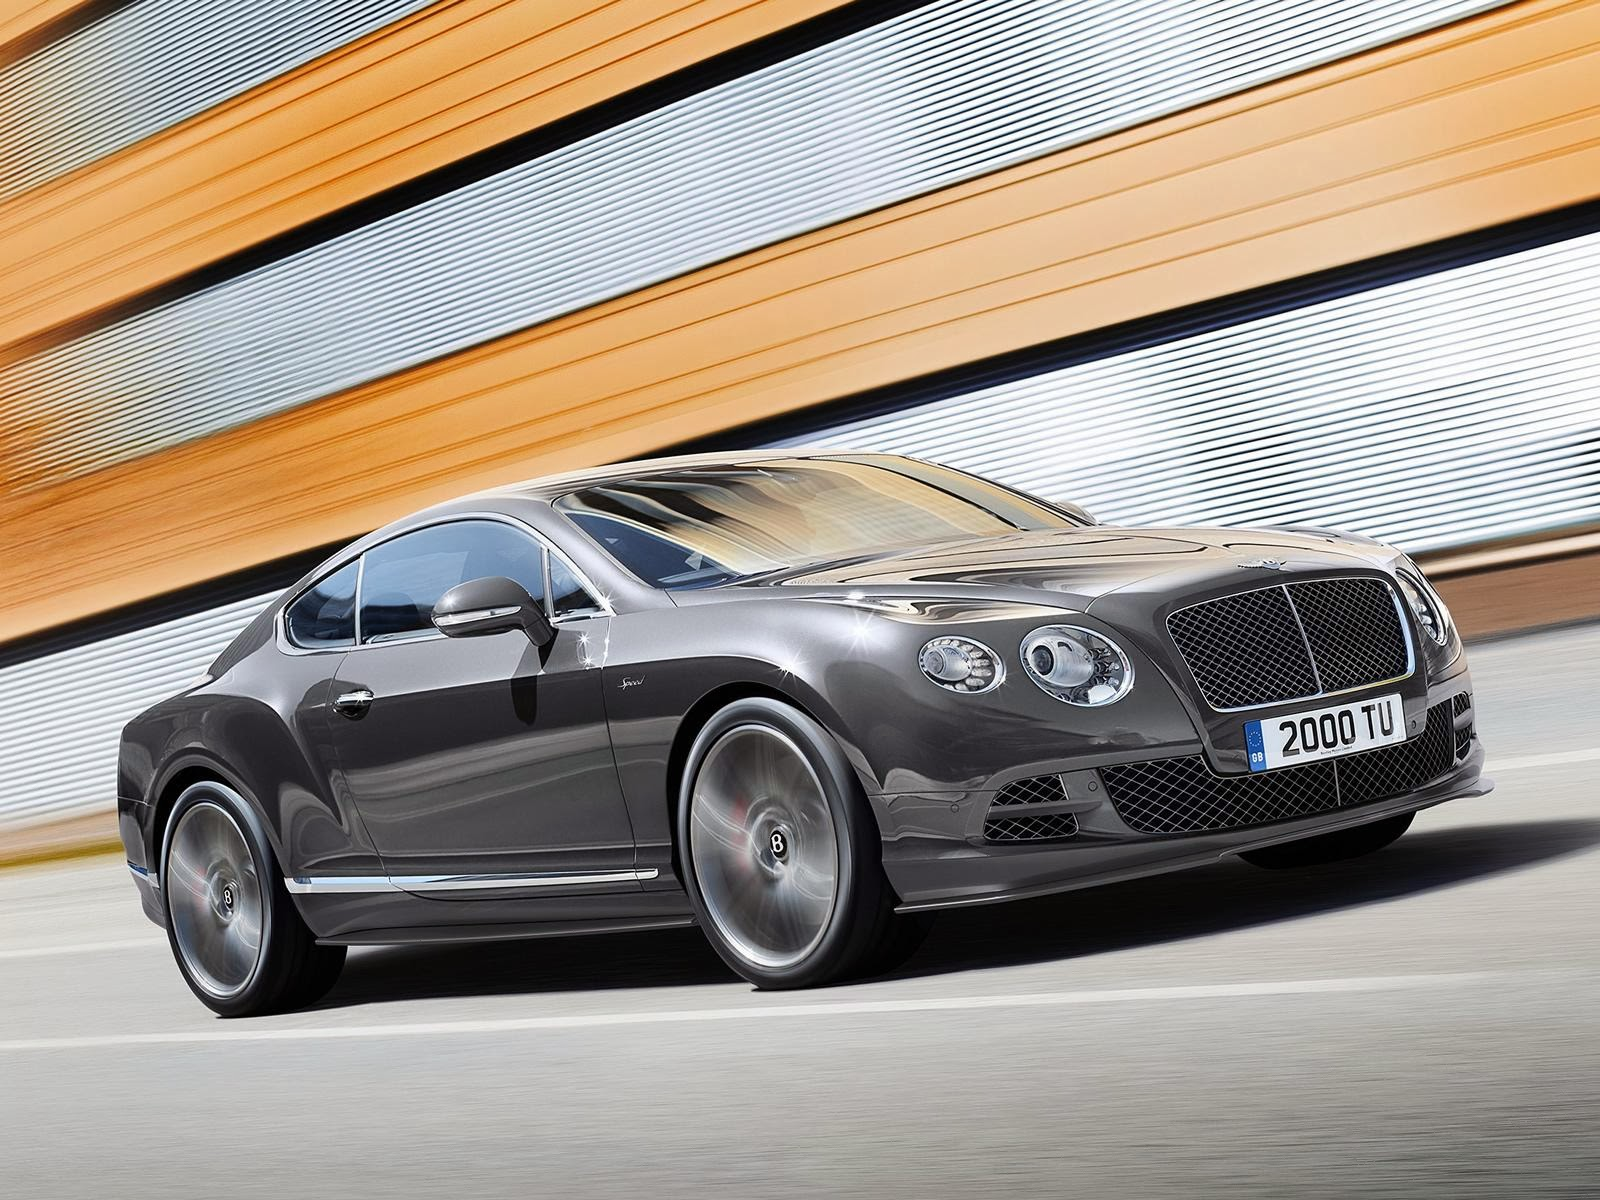 [Resim: Bentley+Continental+GT+Speed+1.jpg]